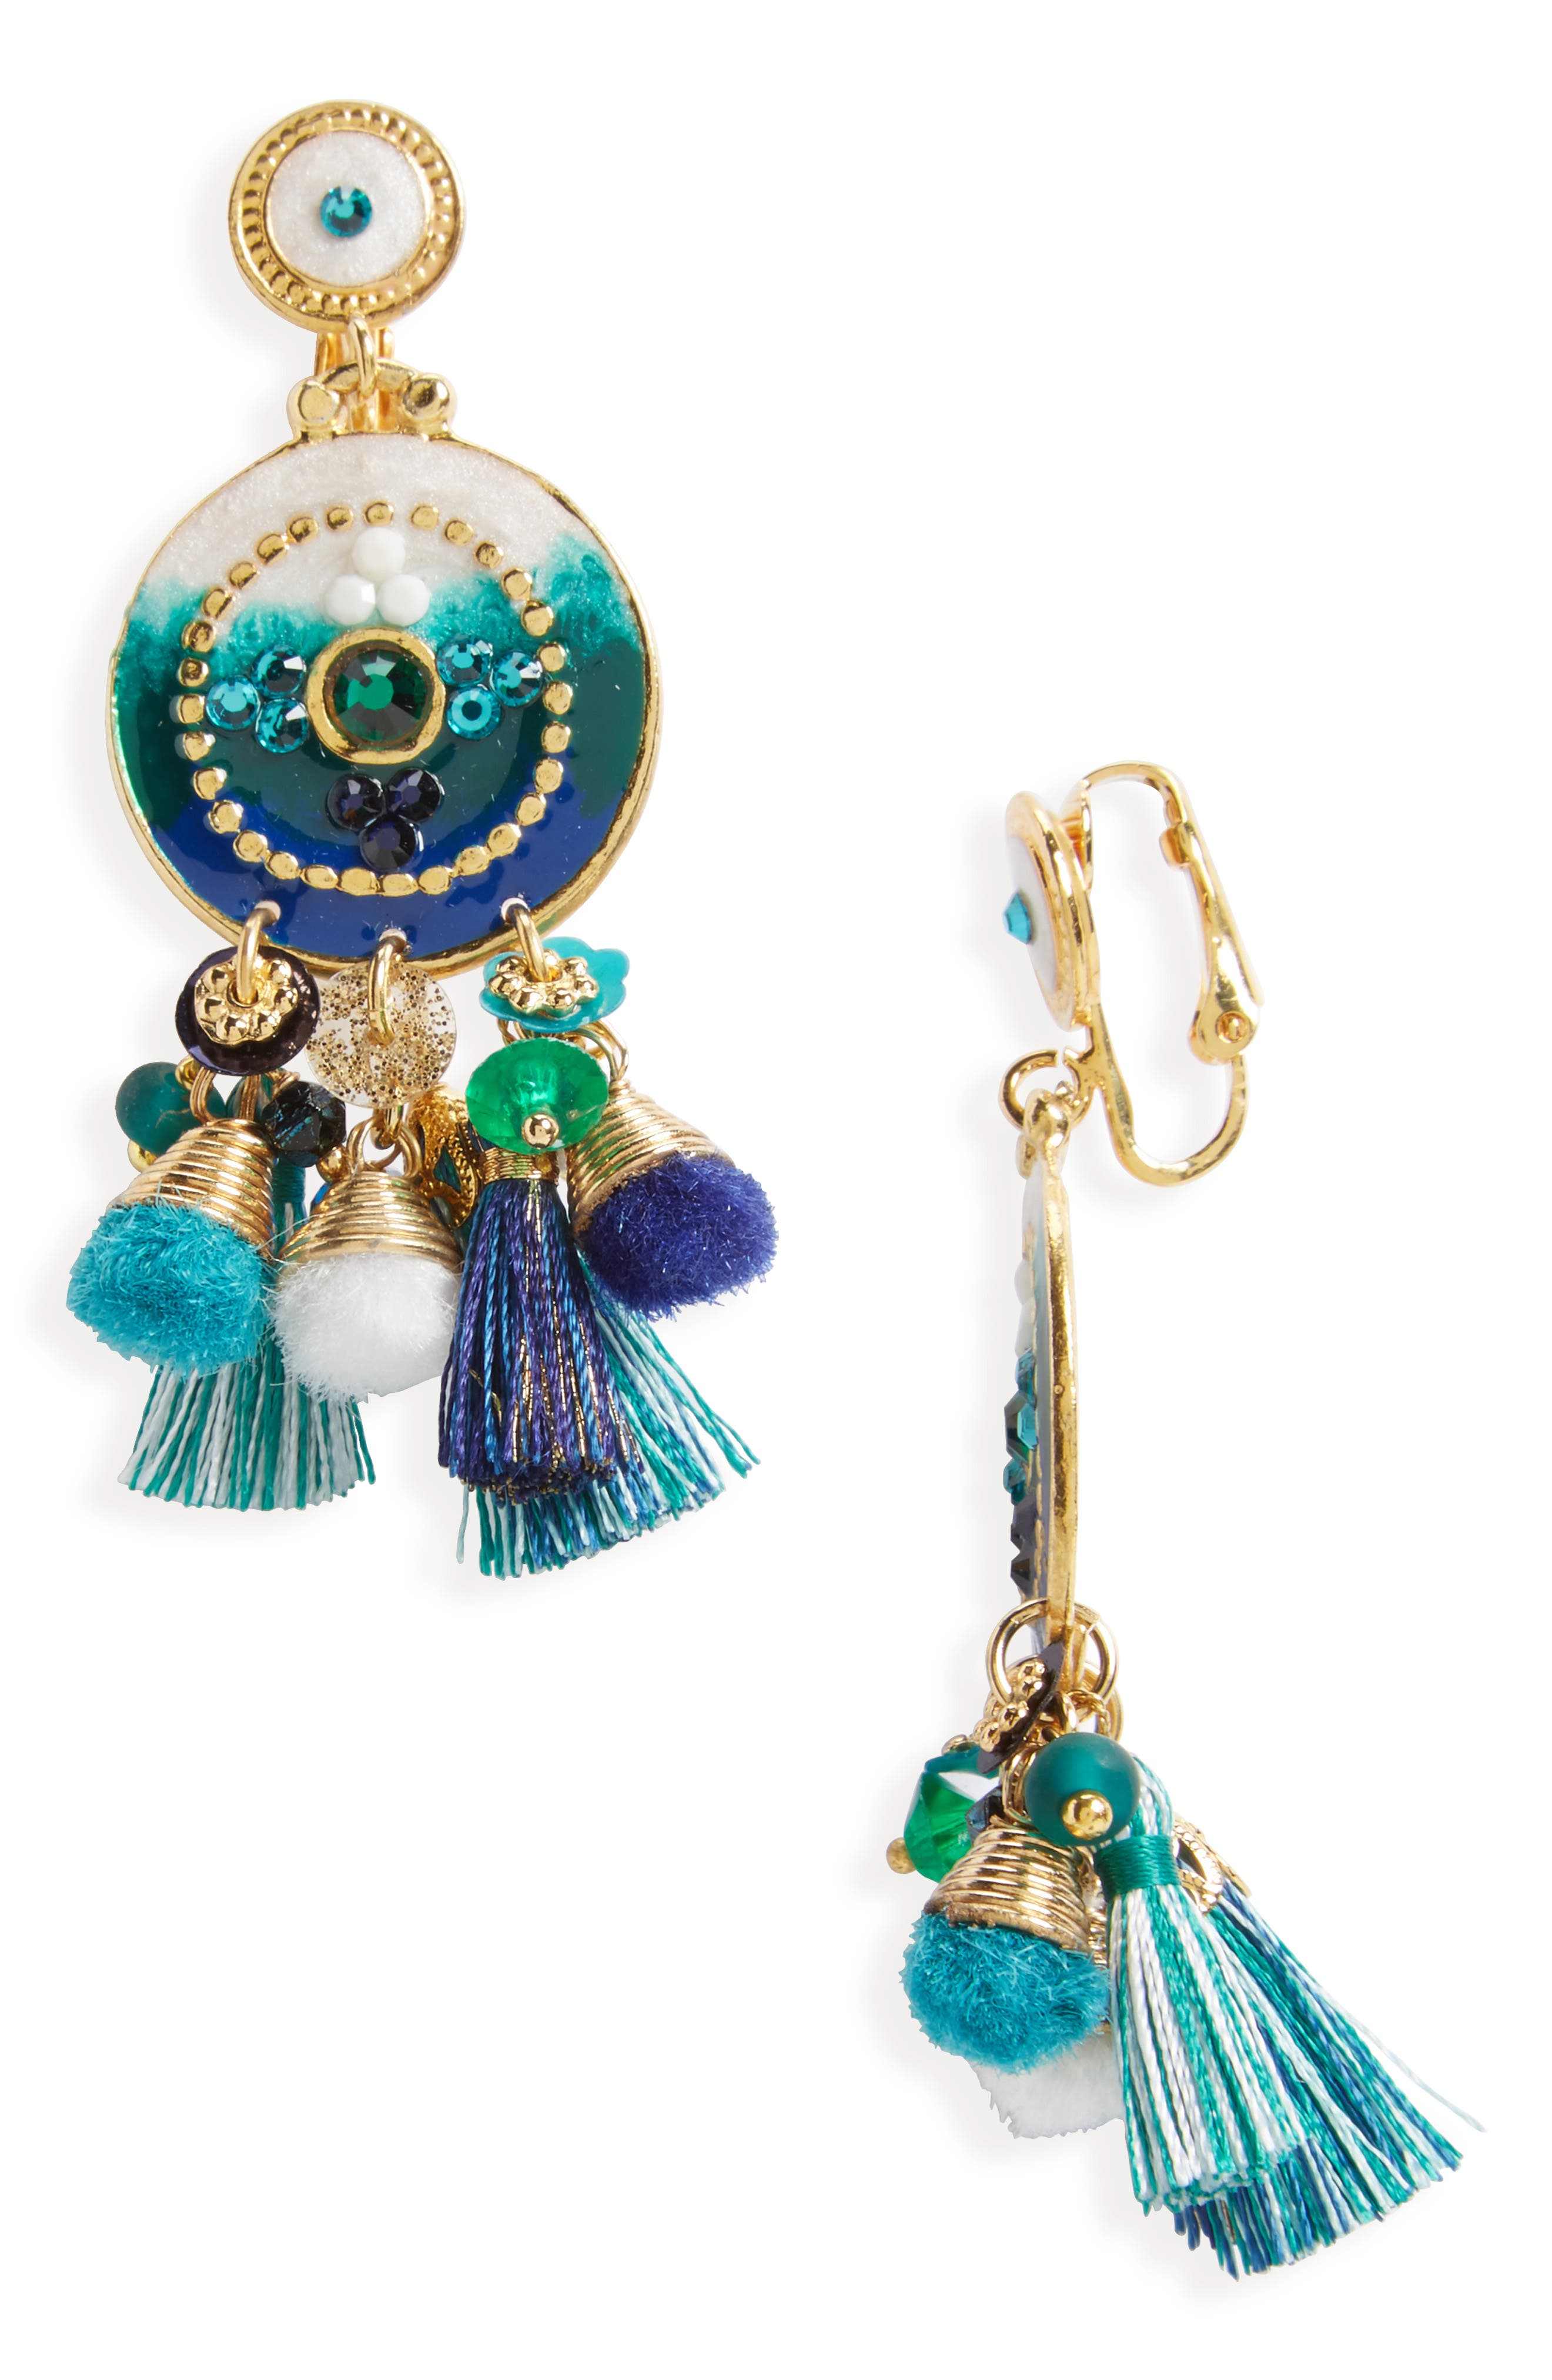 Stella Clip Earrings,                         Main,                         color, Blue Green